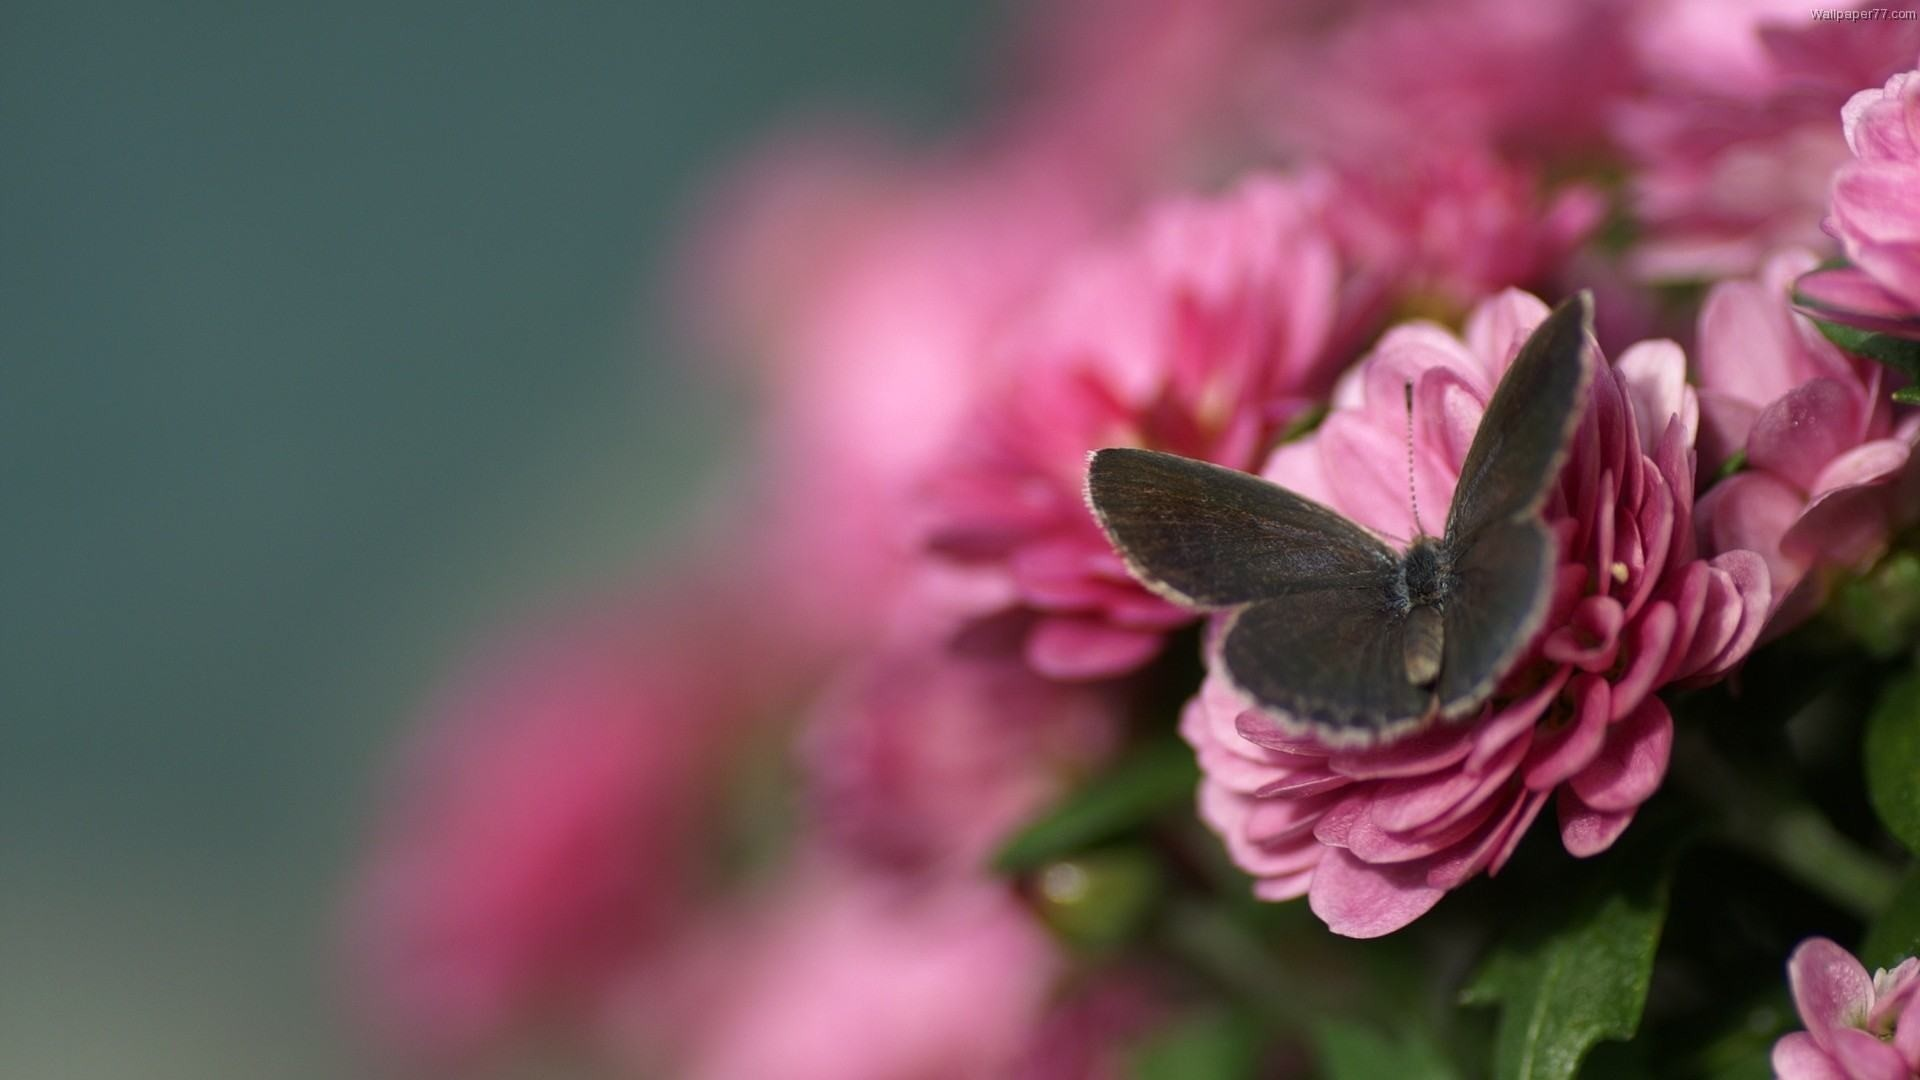 Wallpapers Backgrounds – wallpapers flowers bloom floral rose desktop  blossom